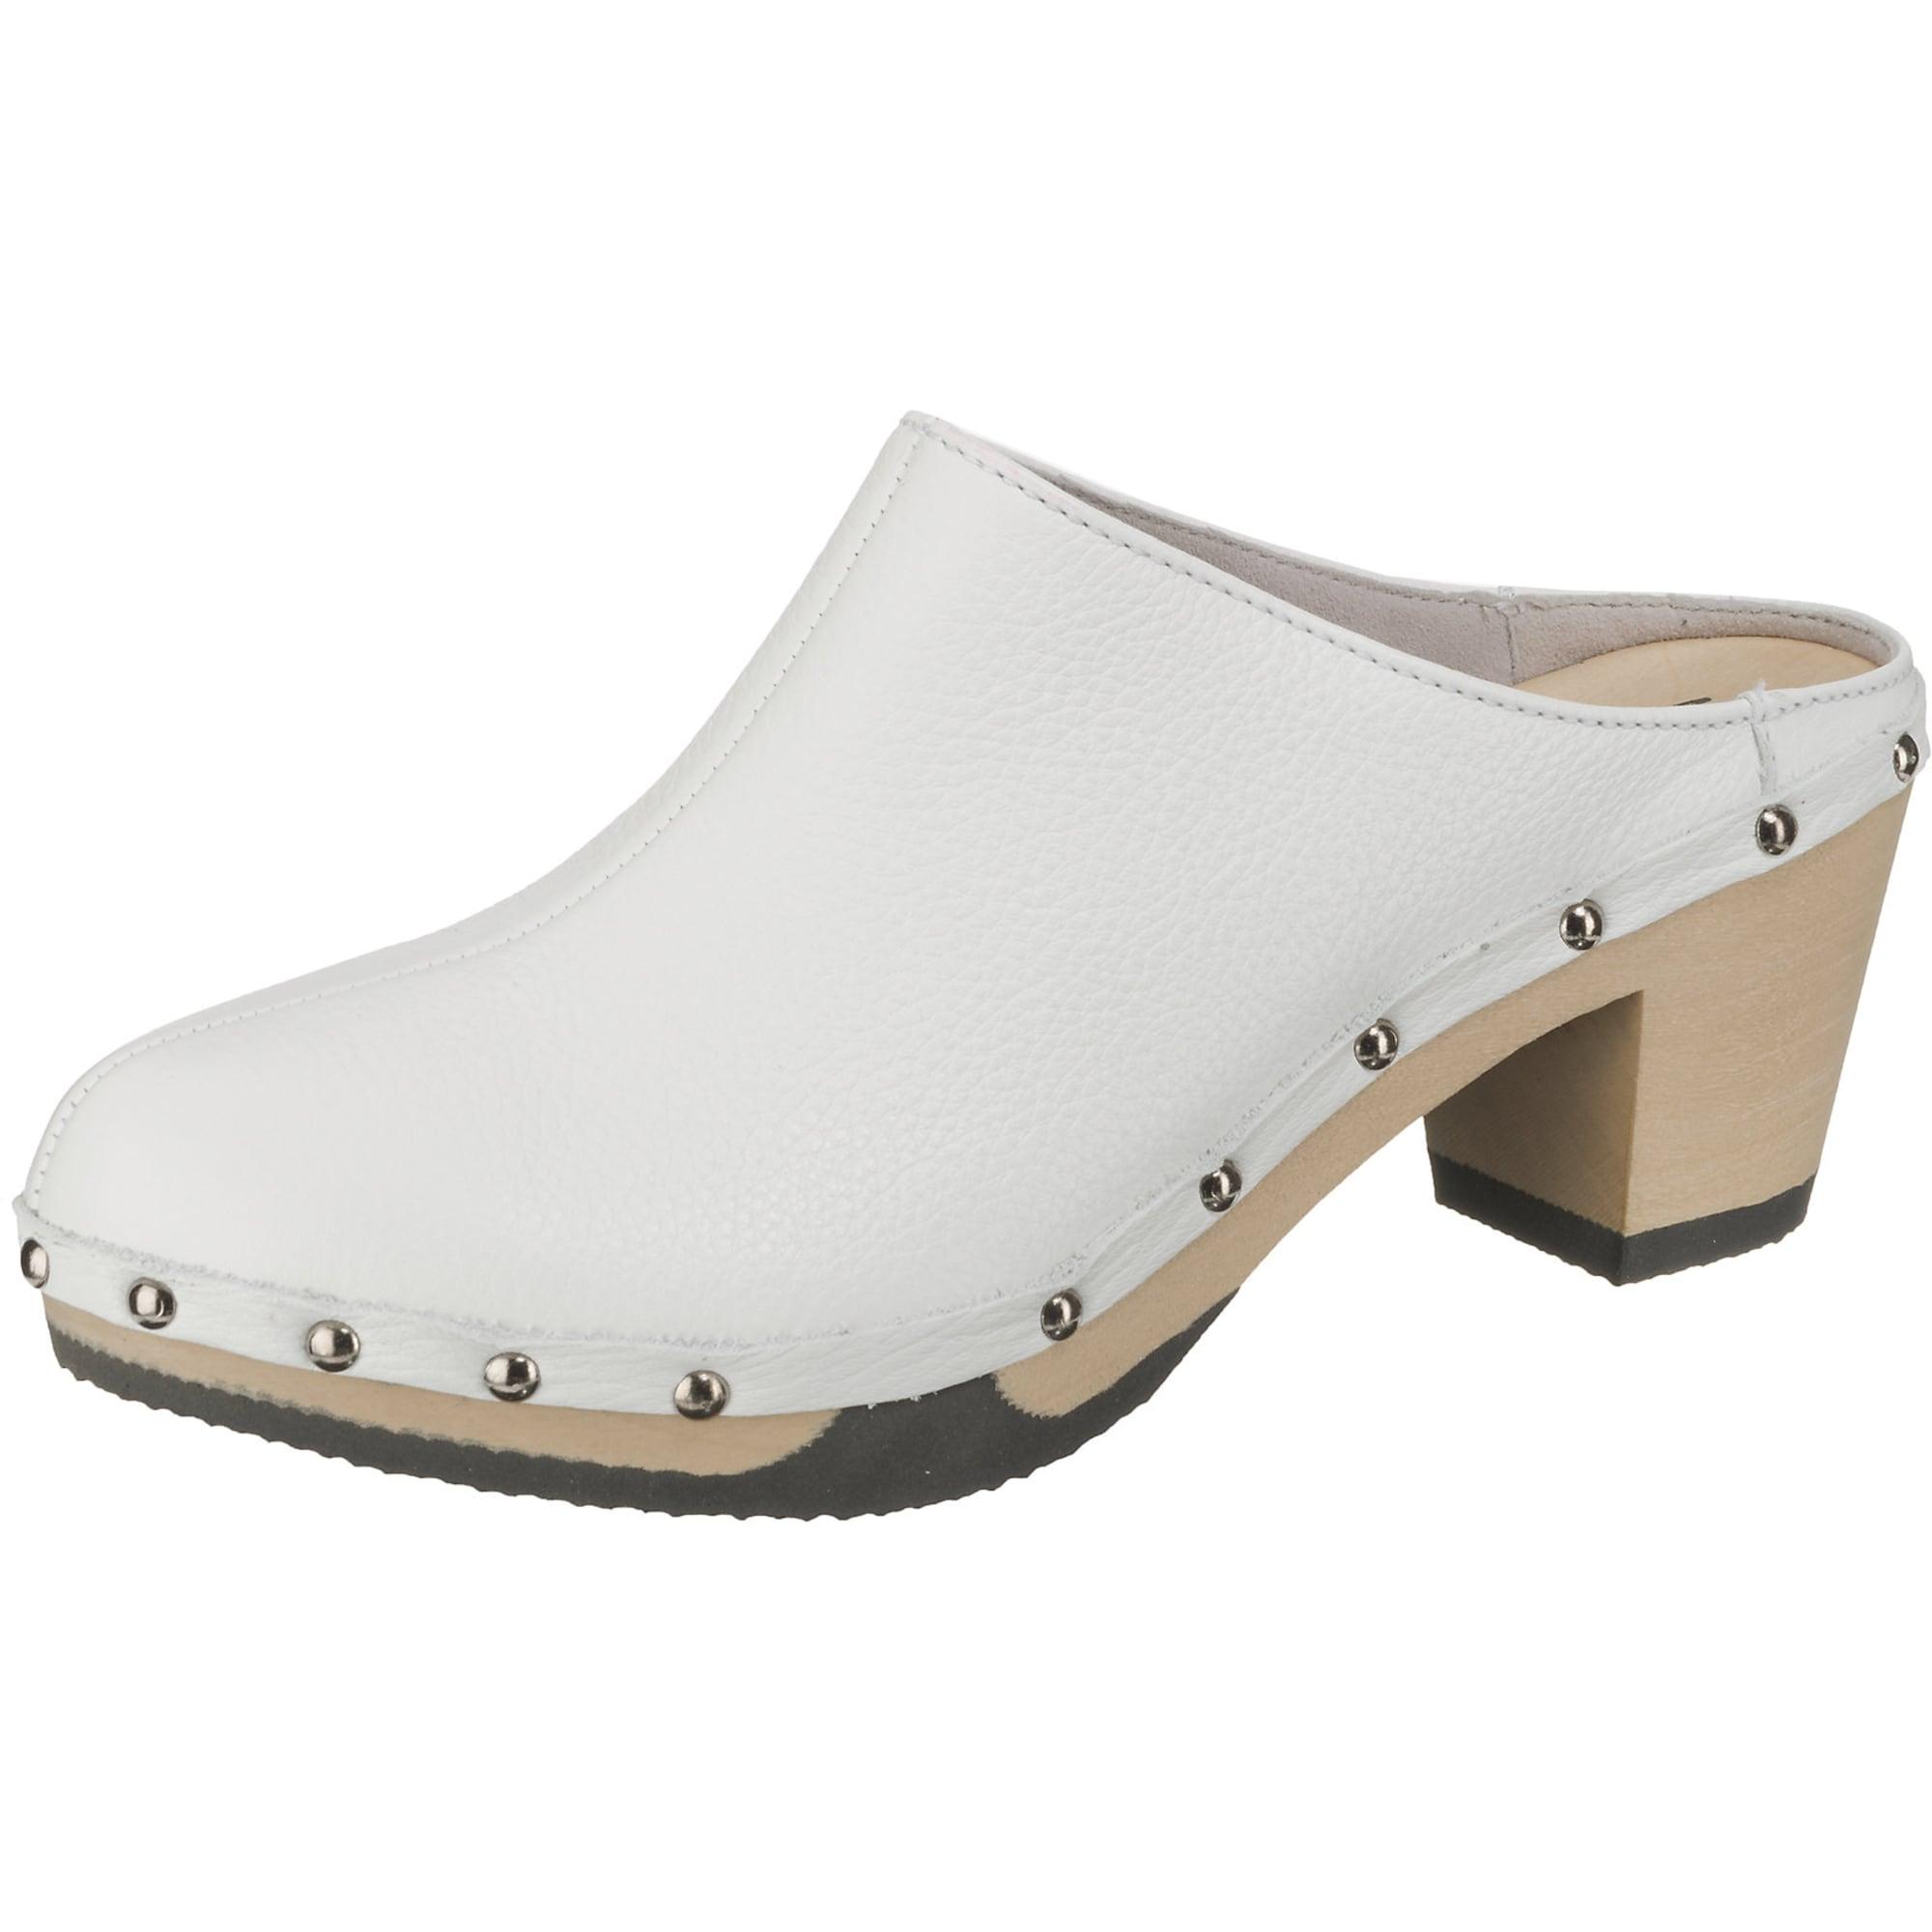 Clogs 'Georgia' | Schuhe > Clogs & Pantoletten > Clogs | Weiß | SOFTCLOX